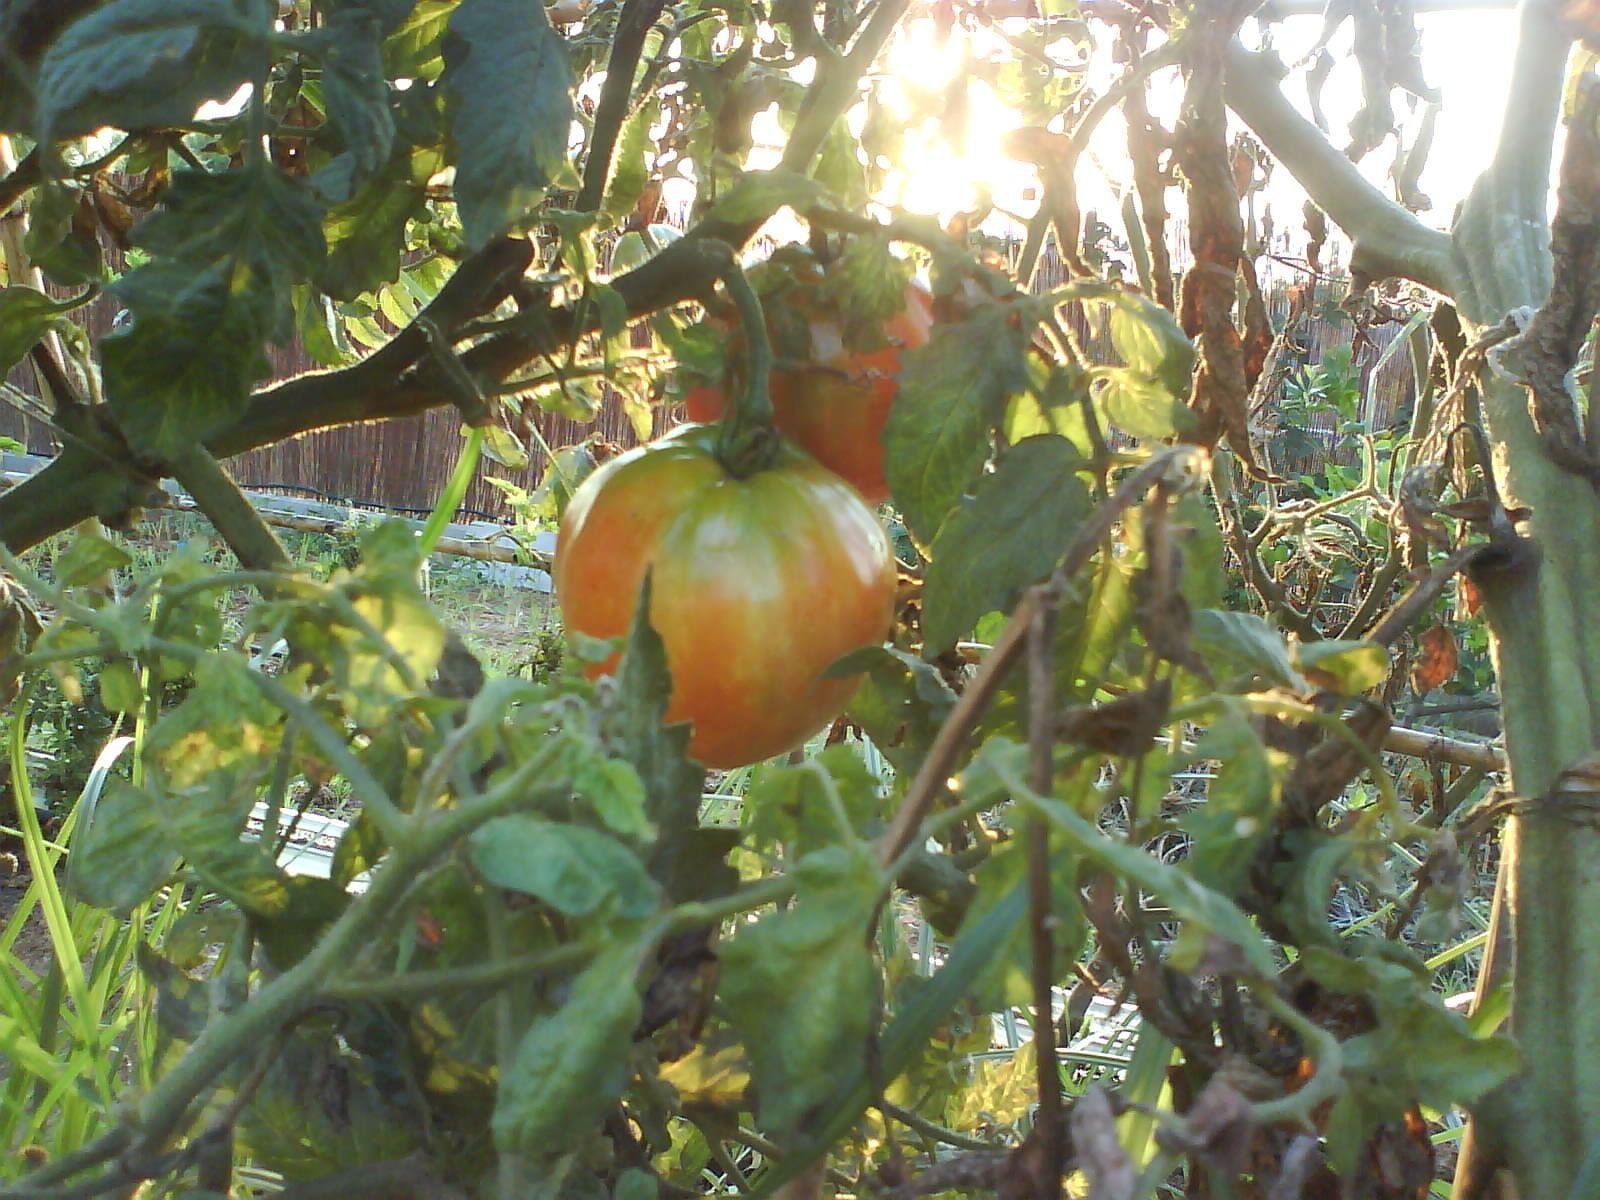 tomates al atardecer